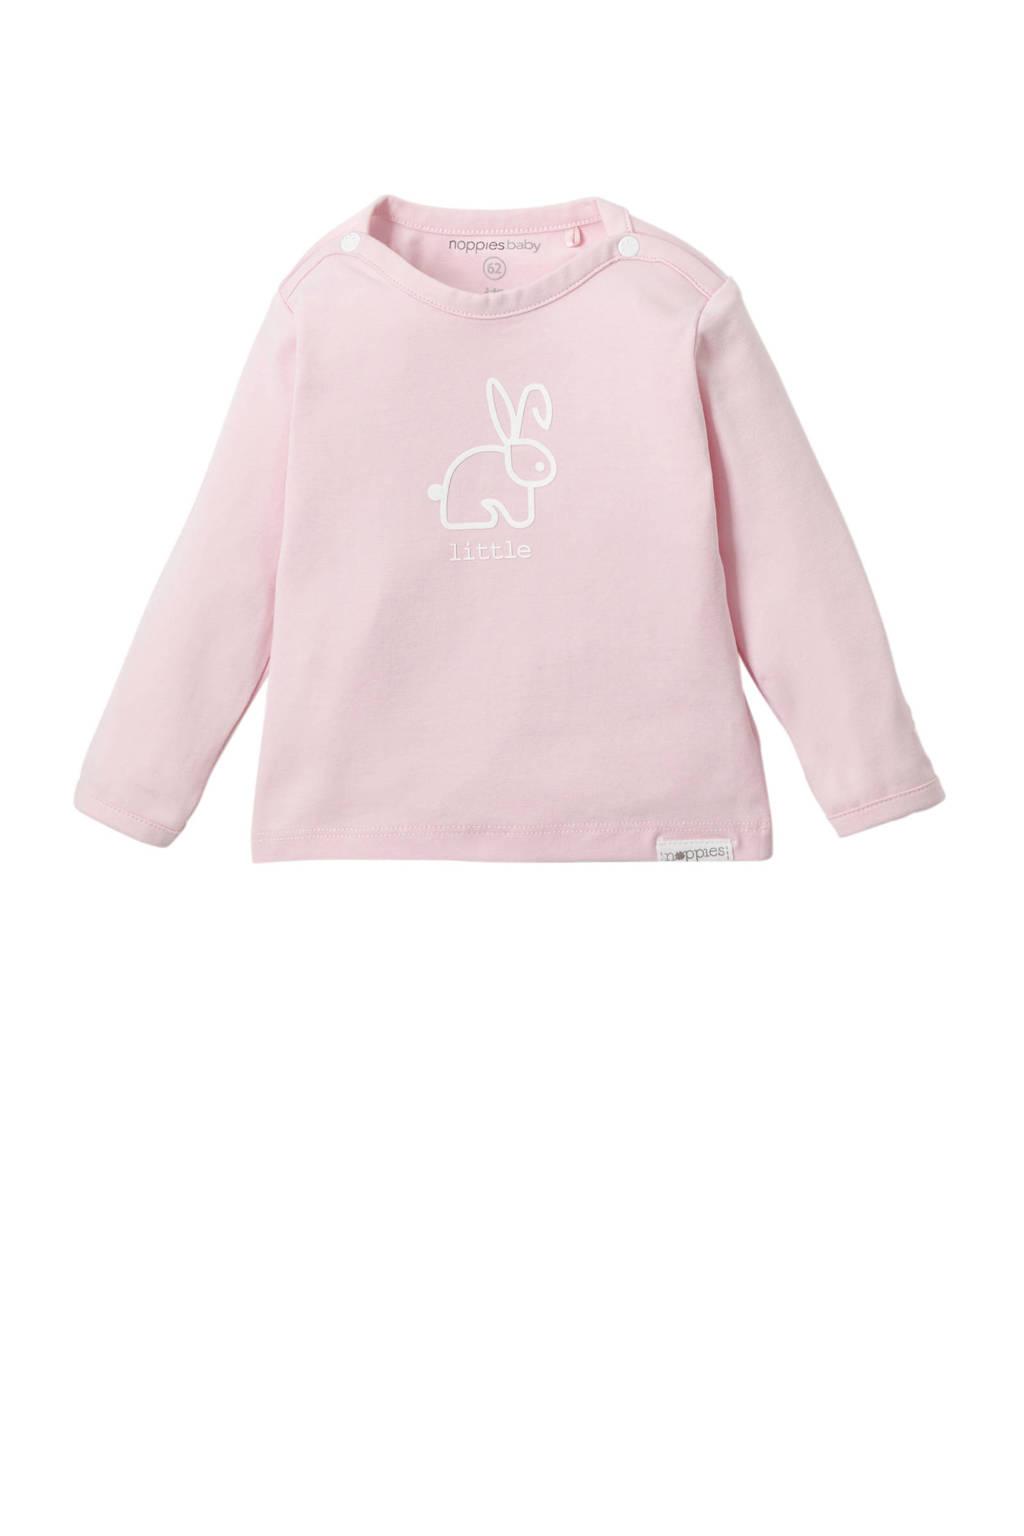 Noppies newborn baby longsleeve Rood, Licht roze